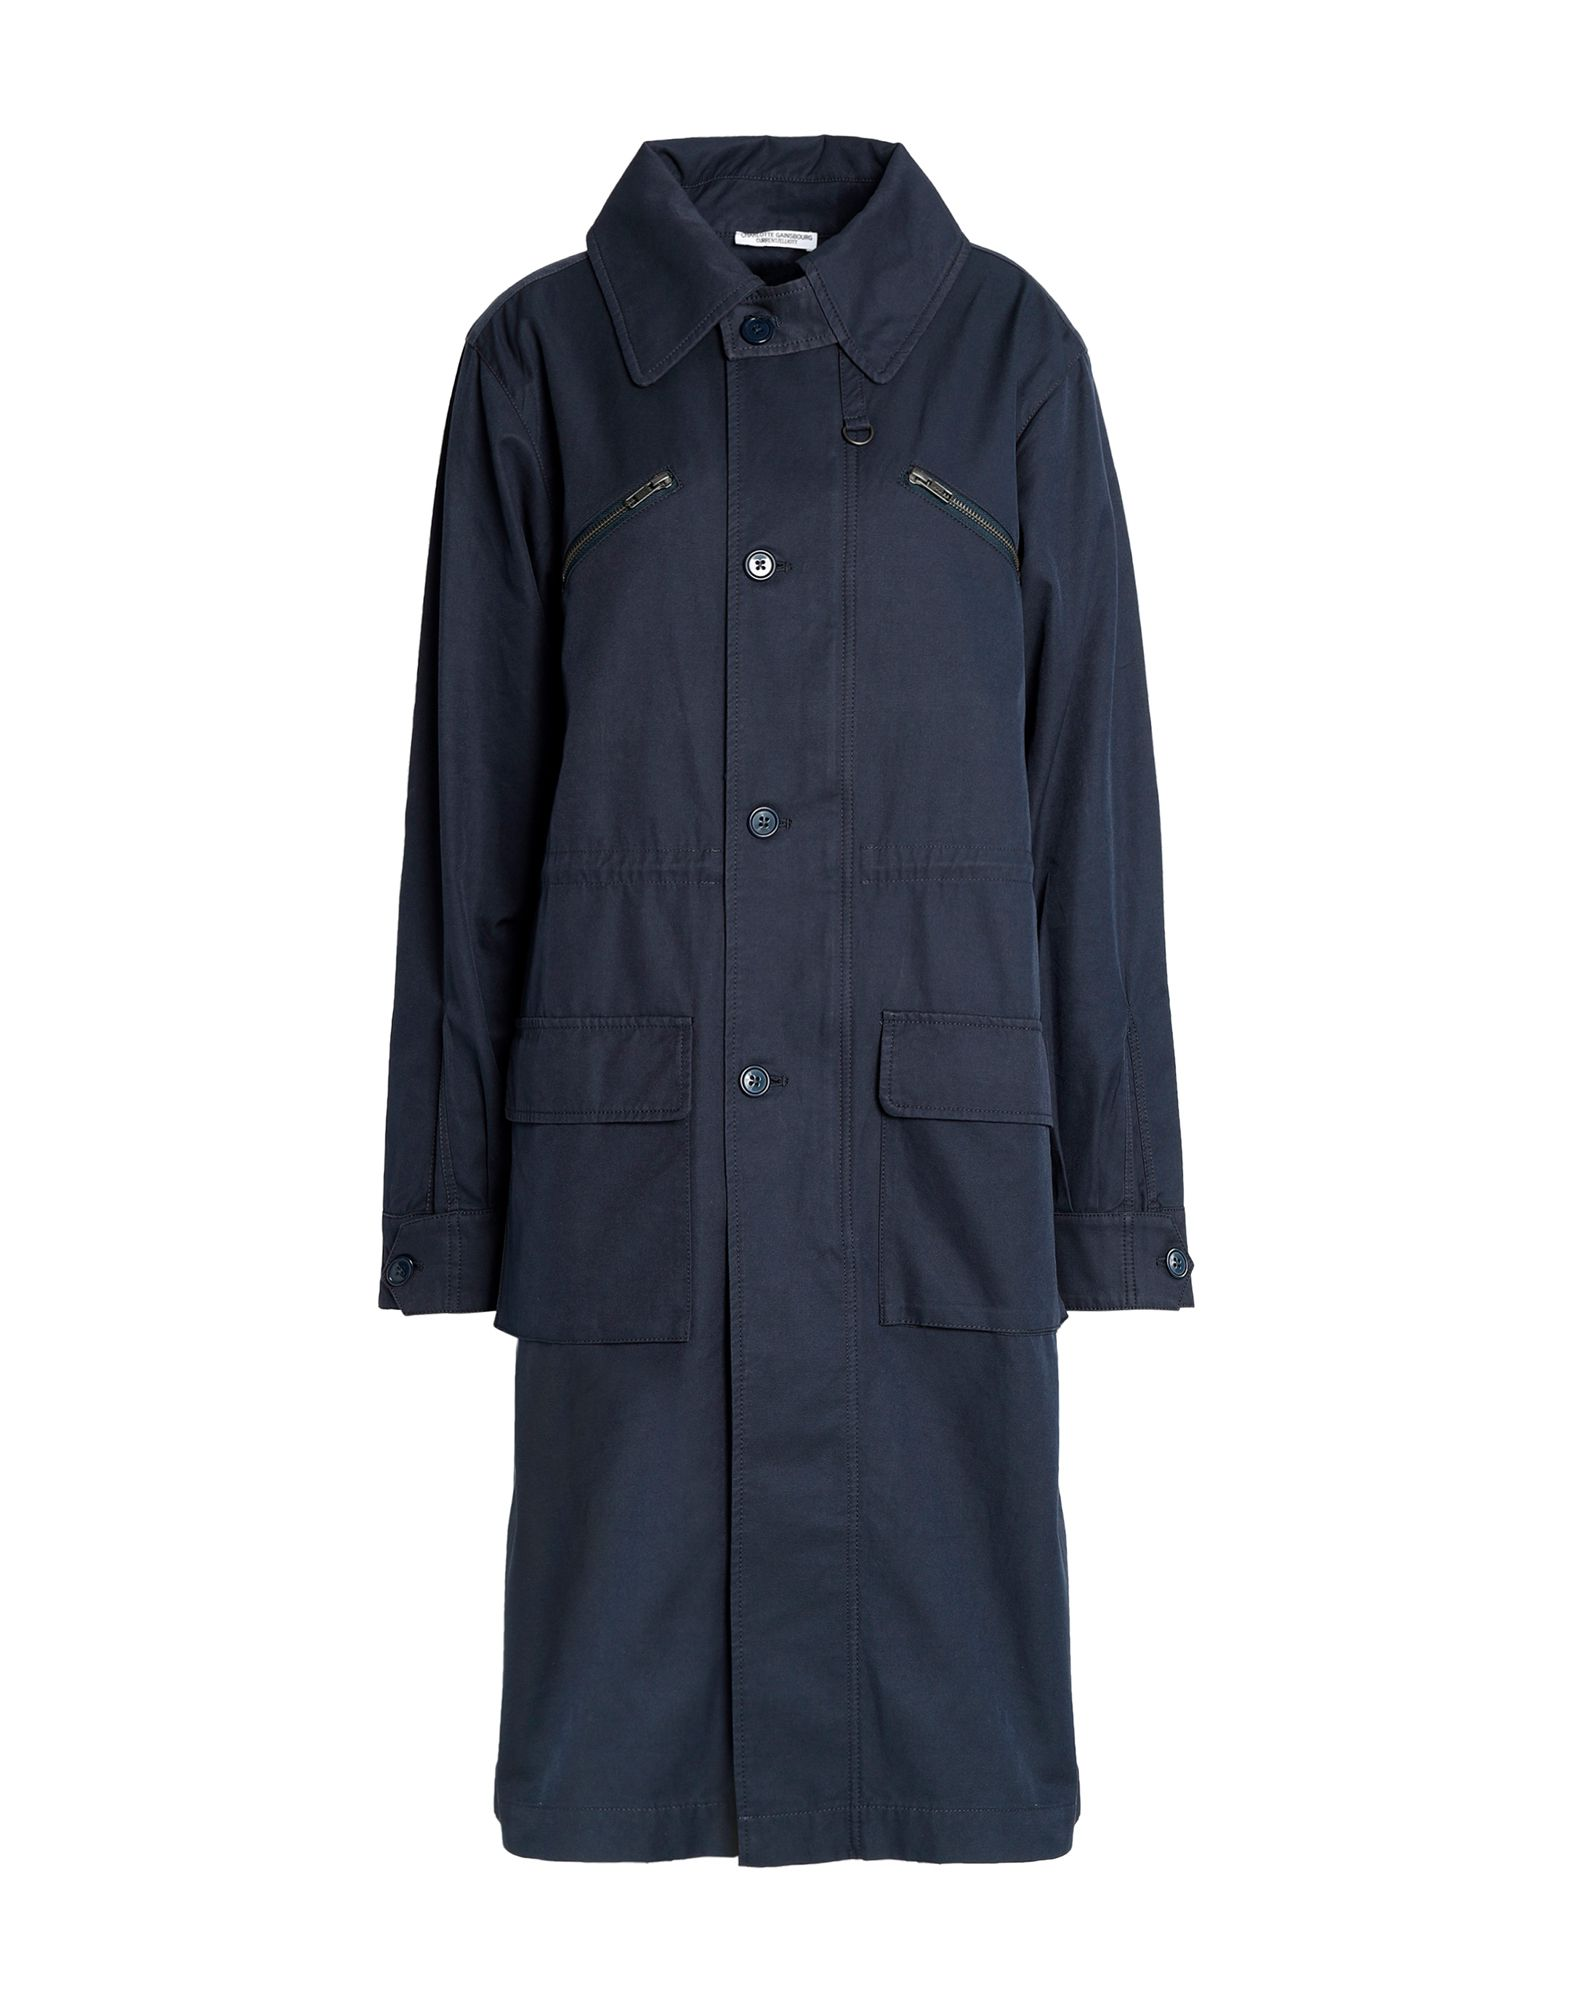 CURRENT/ELLIOTT + CHARLOTTE GAINSBOURG Легкое пальто current elliott charlotte gainsbourg pубашка